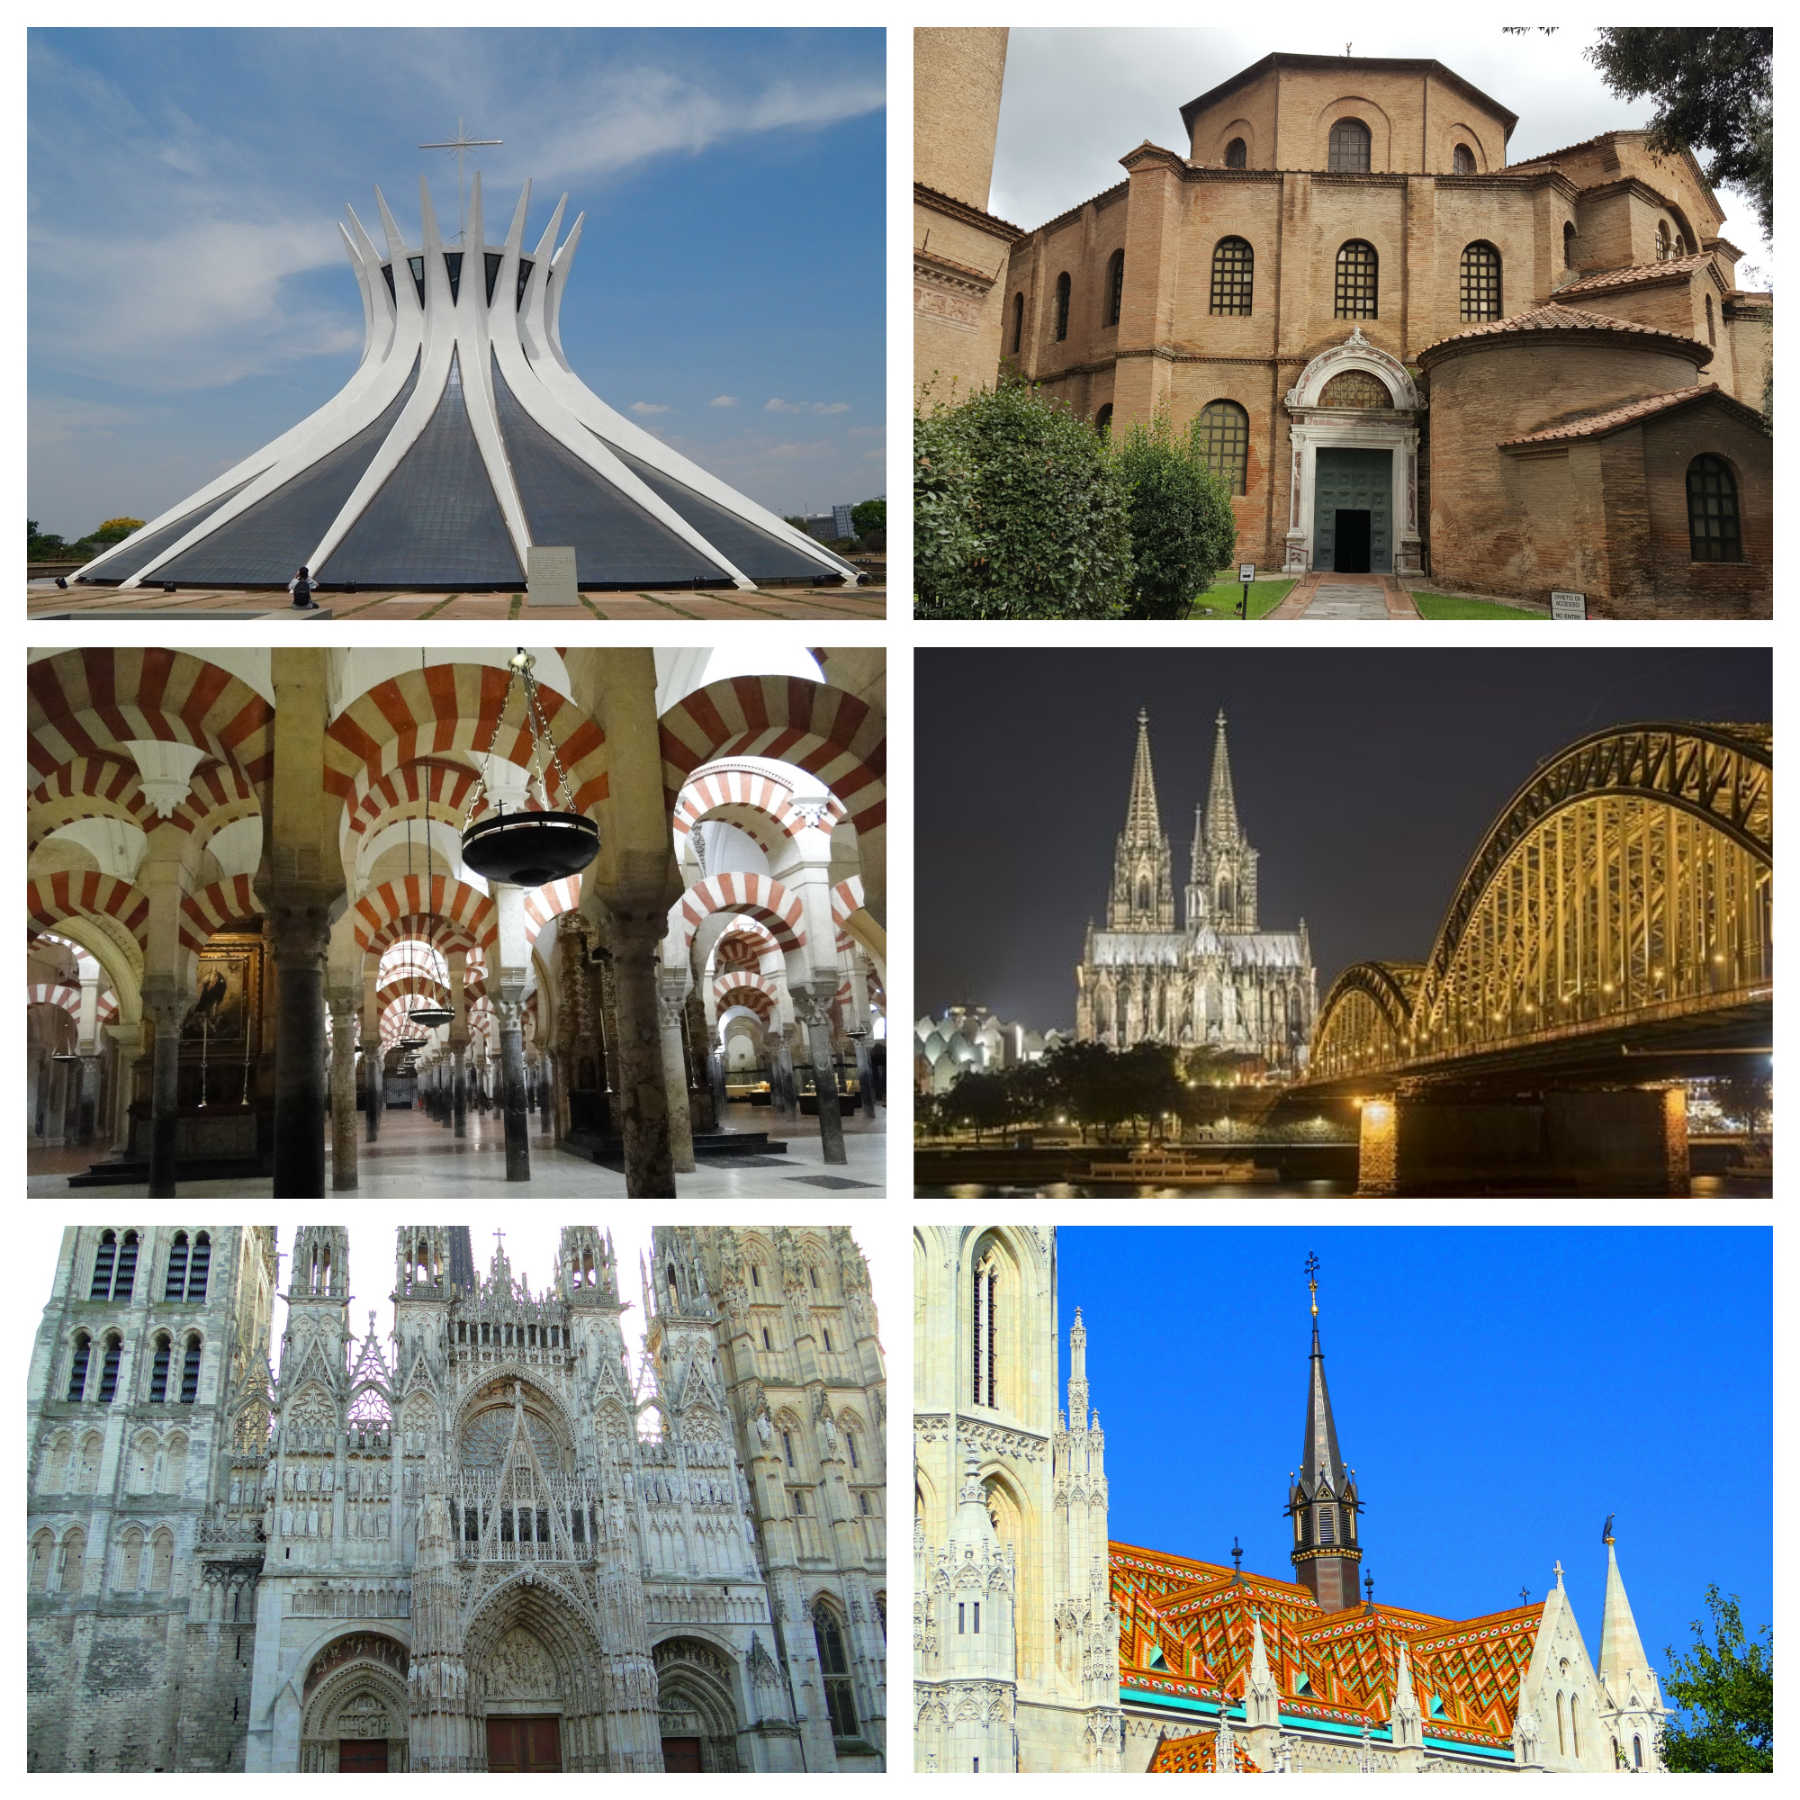 Catedral de Brasília, Basílica de San Vitale, Mesquita de Córdoba, Catedral de Colônia, Catedral de Rouen, Igreja de Matias.